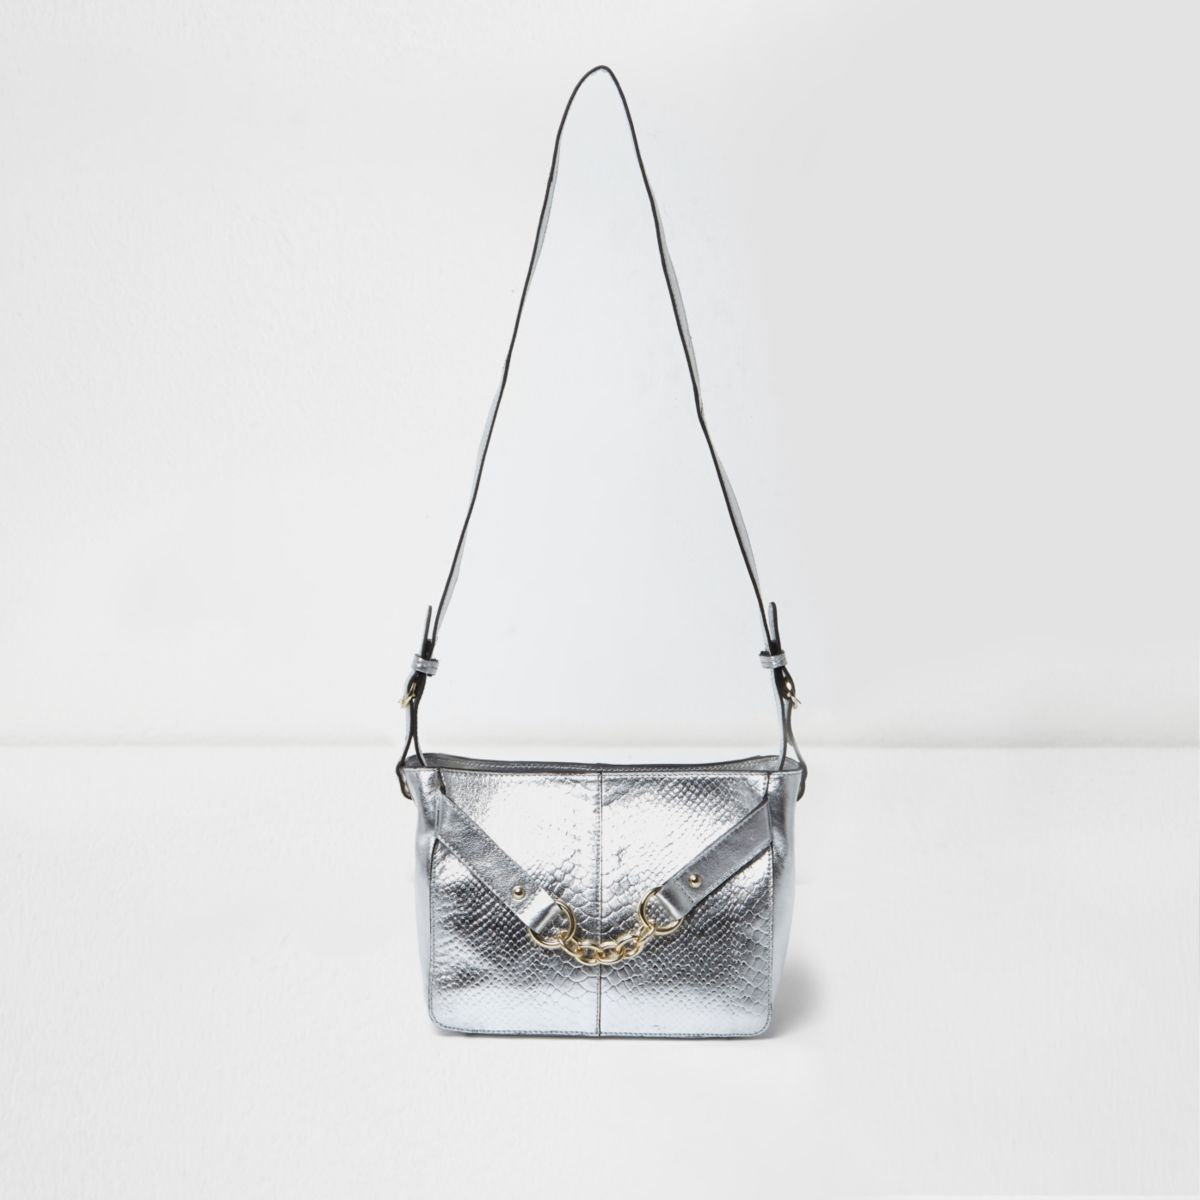 Silver metallic leather chain shoulder bag